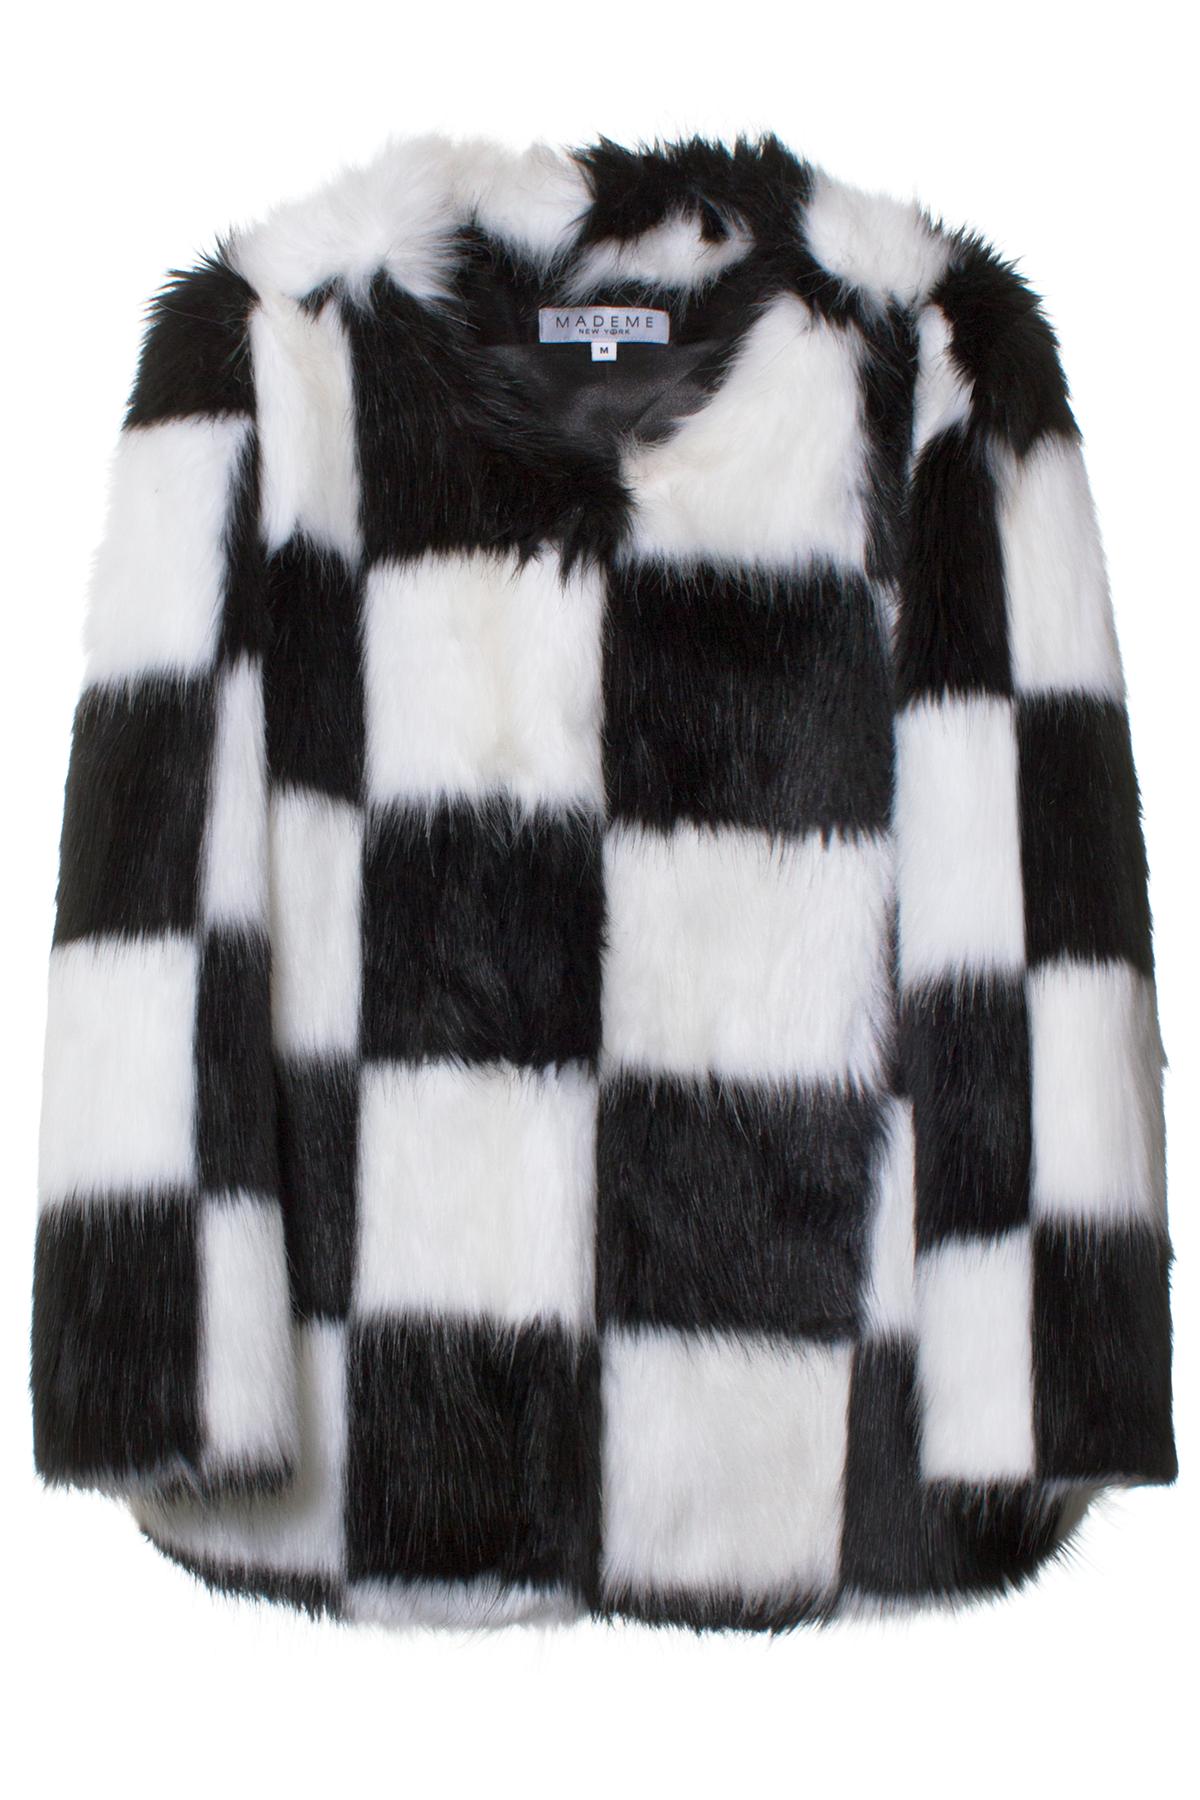 MADEME BLACK/WHITE CHECKERED FUR COAT Black and white faux fur ...